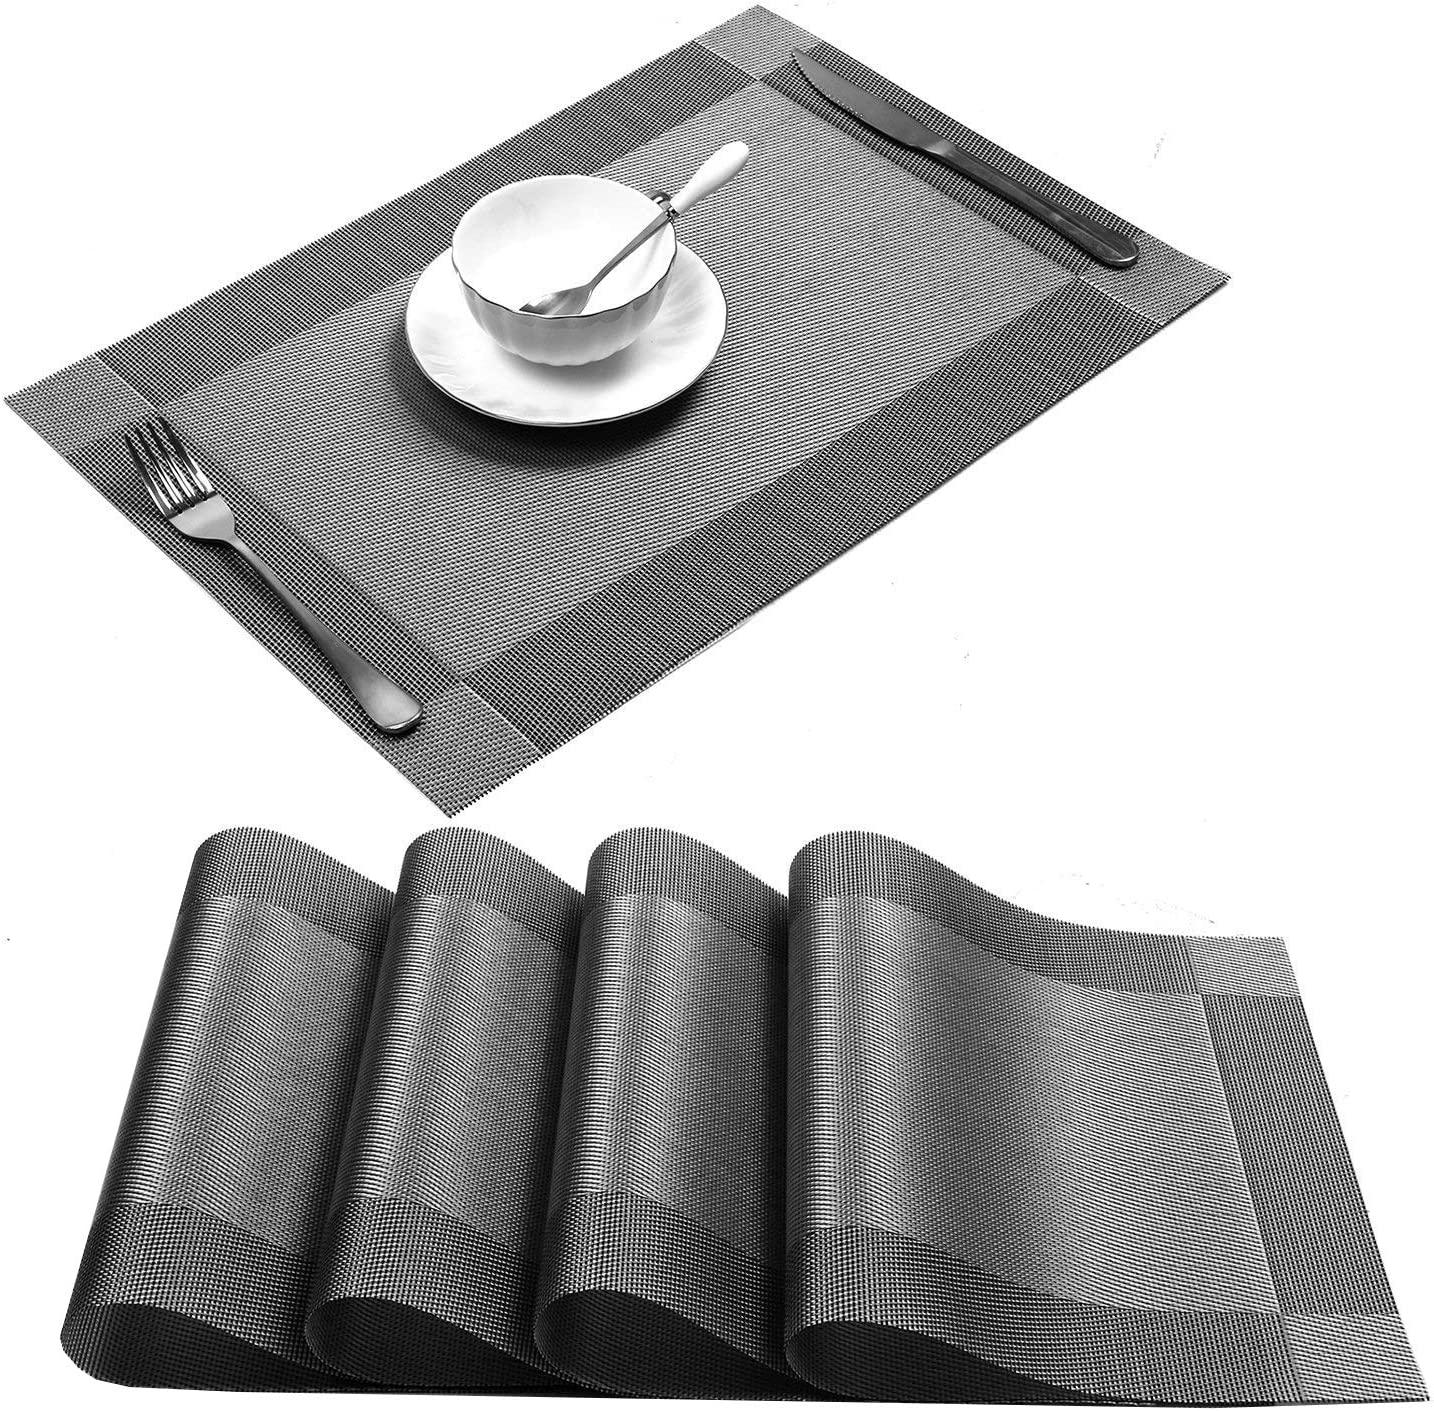 U'Artlines Placemat, Crossweave Woven Vinyl Non-Slip Insulation Placemat Washable Table Mats (Grey, 4pcs placemats): Home & Kitchen